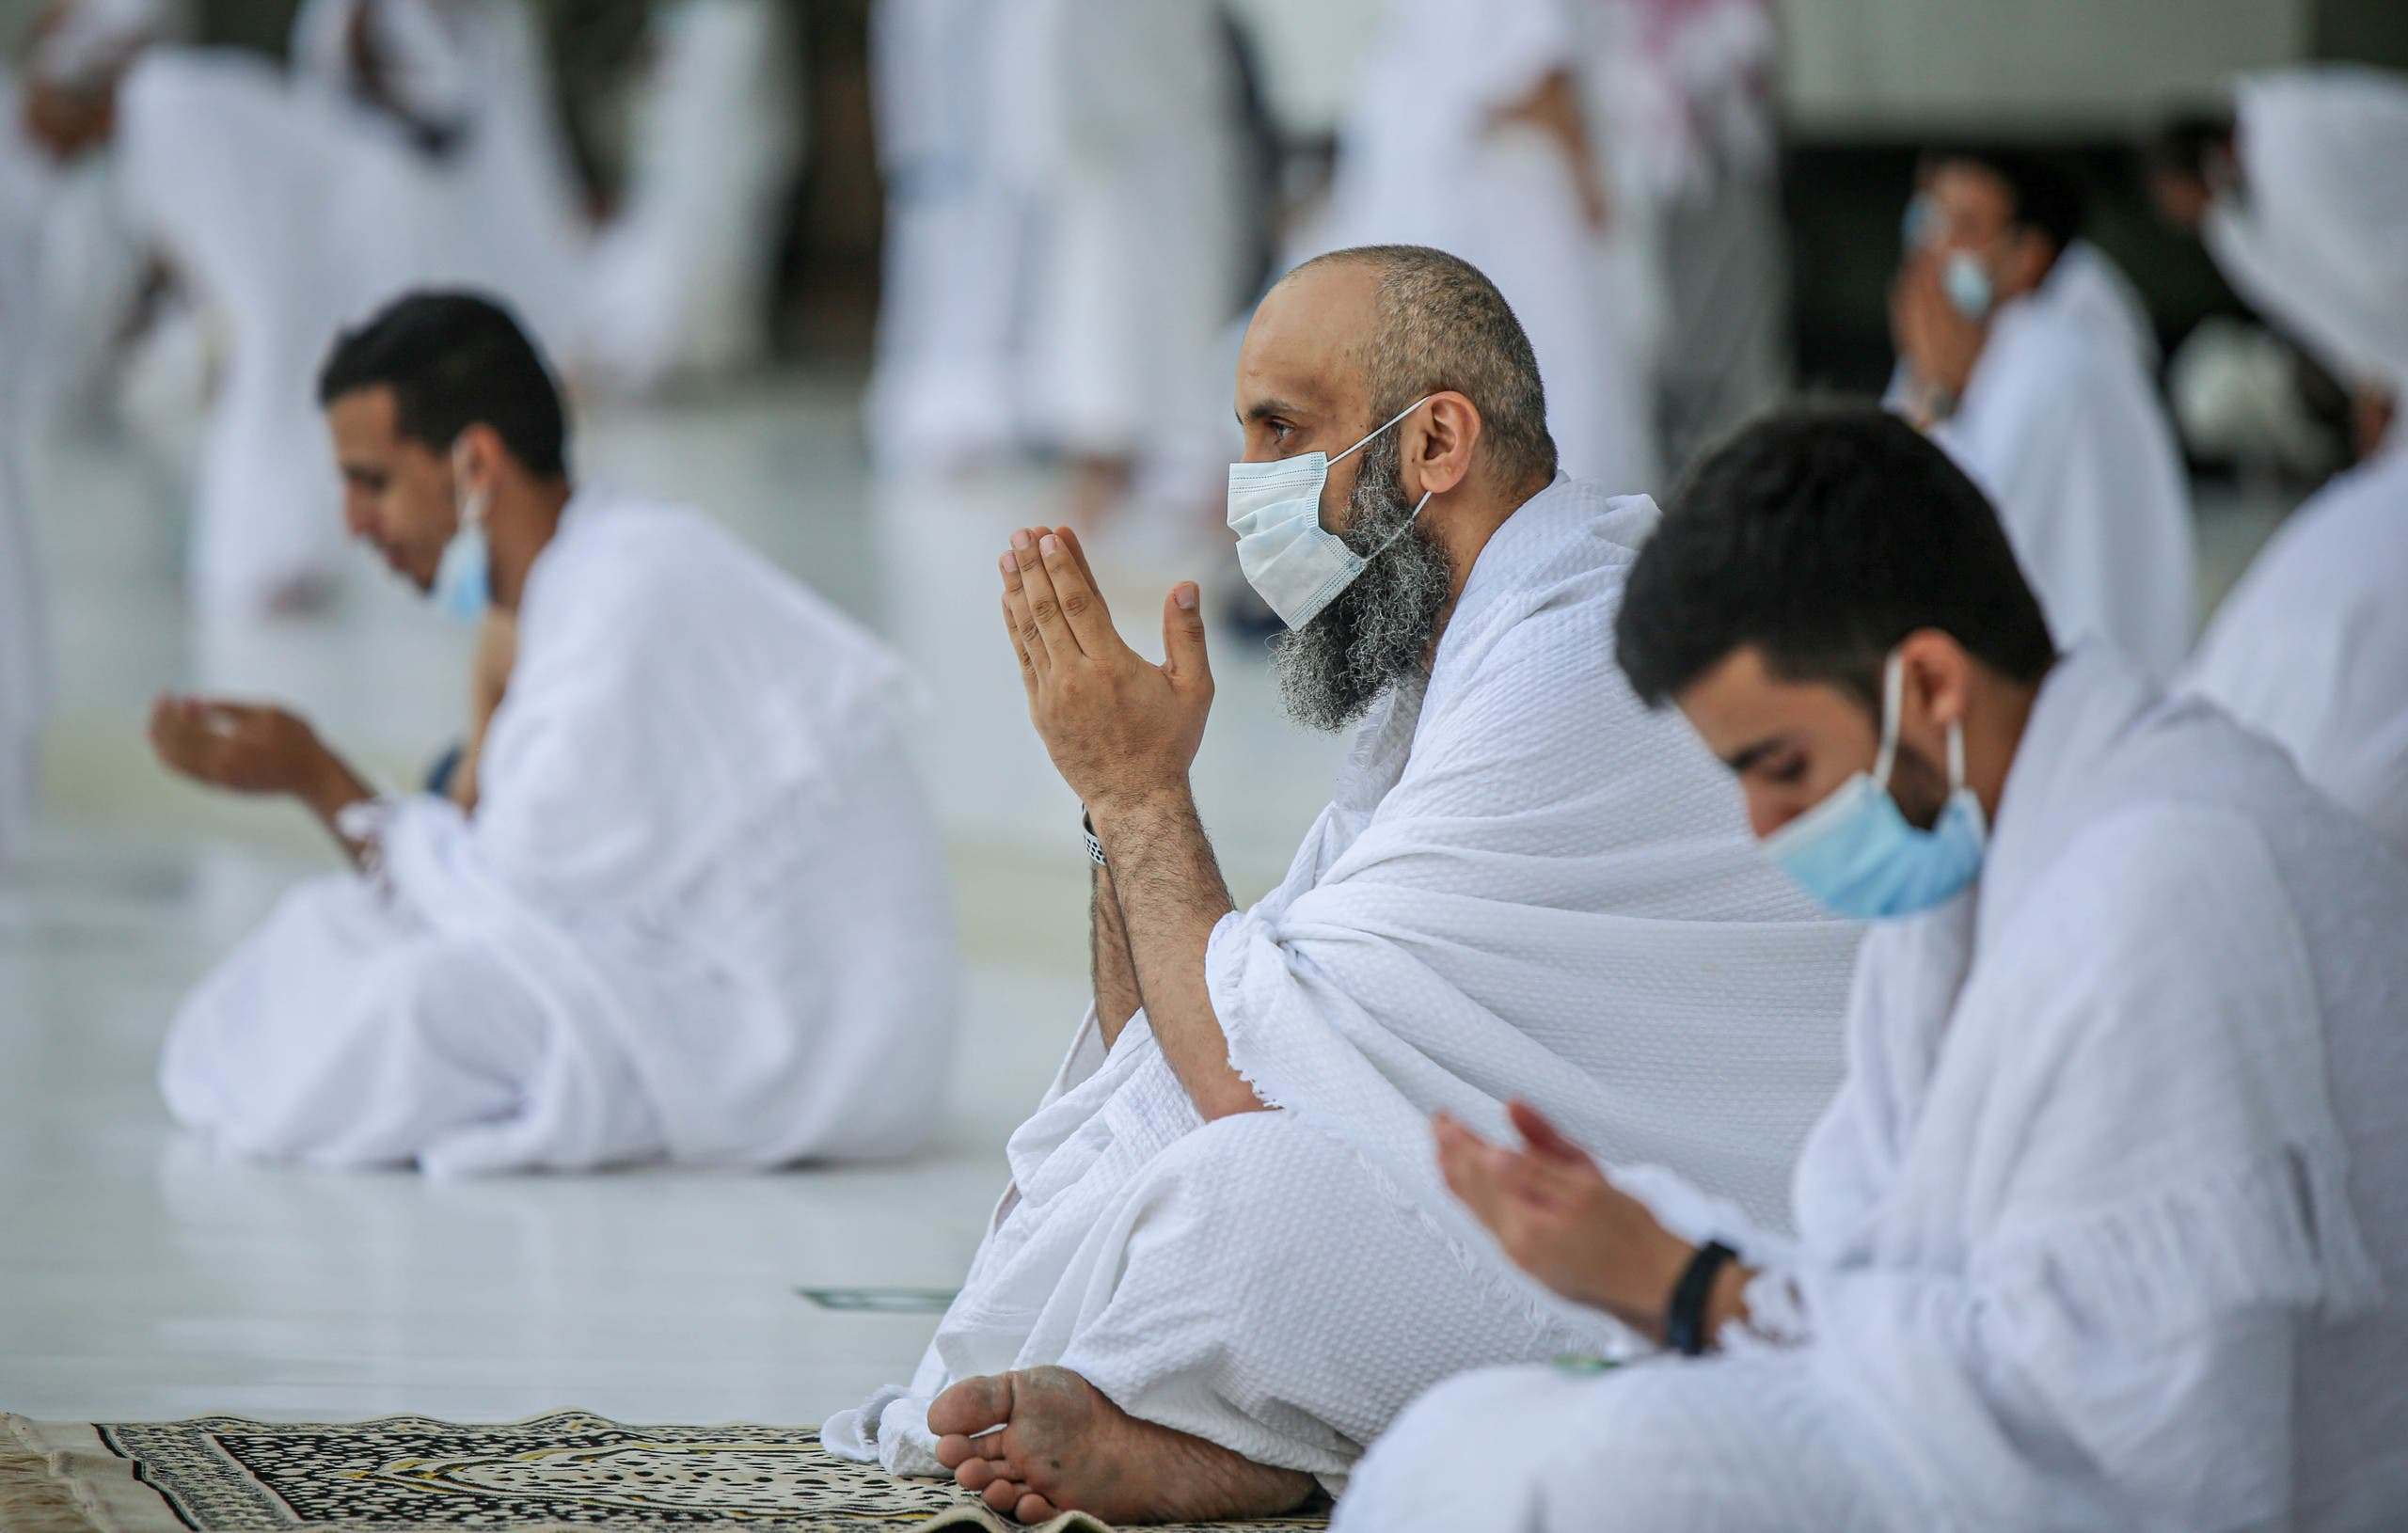 Muslims perform Umrah at the Grand Mosque in Mecca, Saudi Arabia. (Reuters)